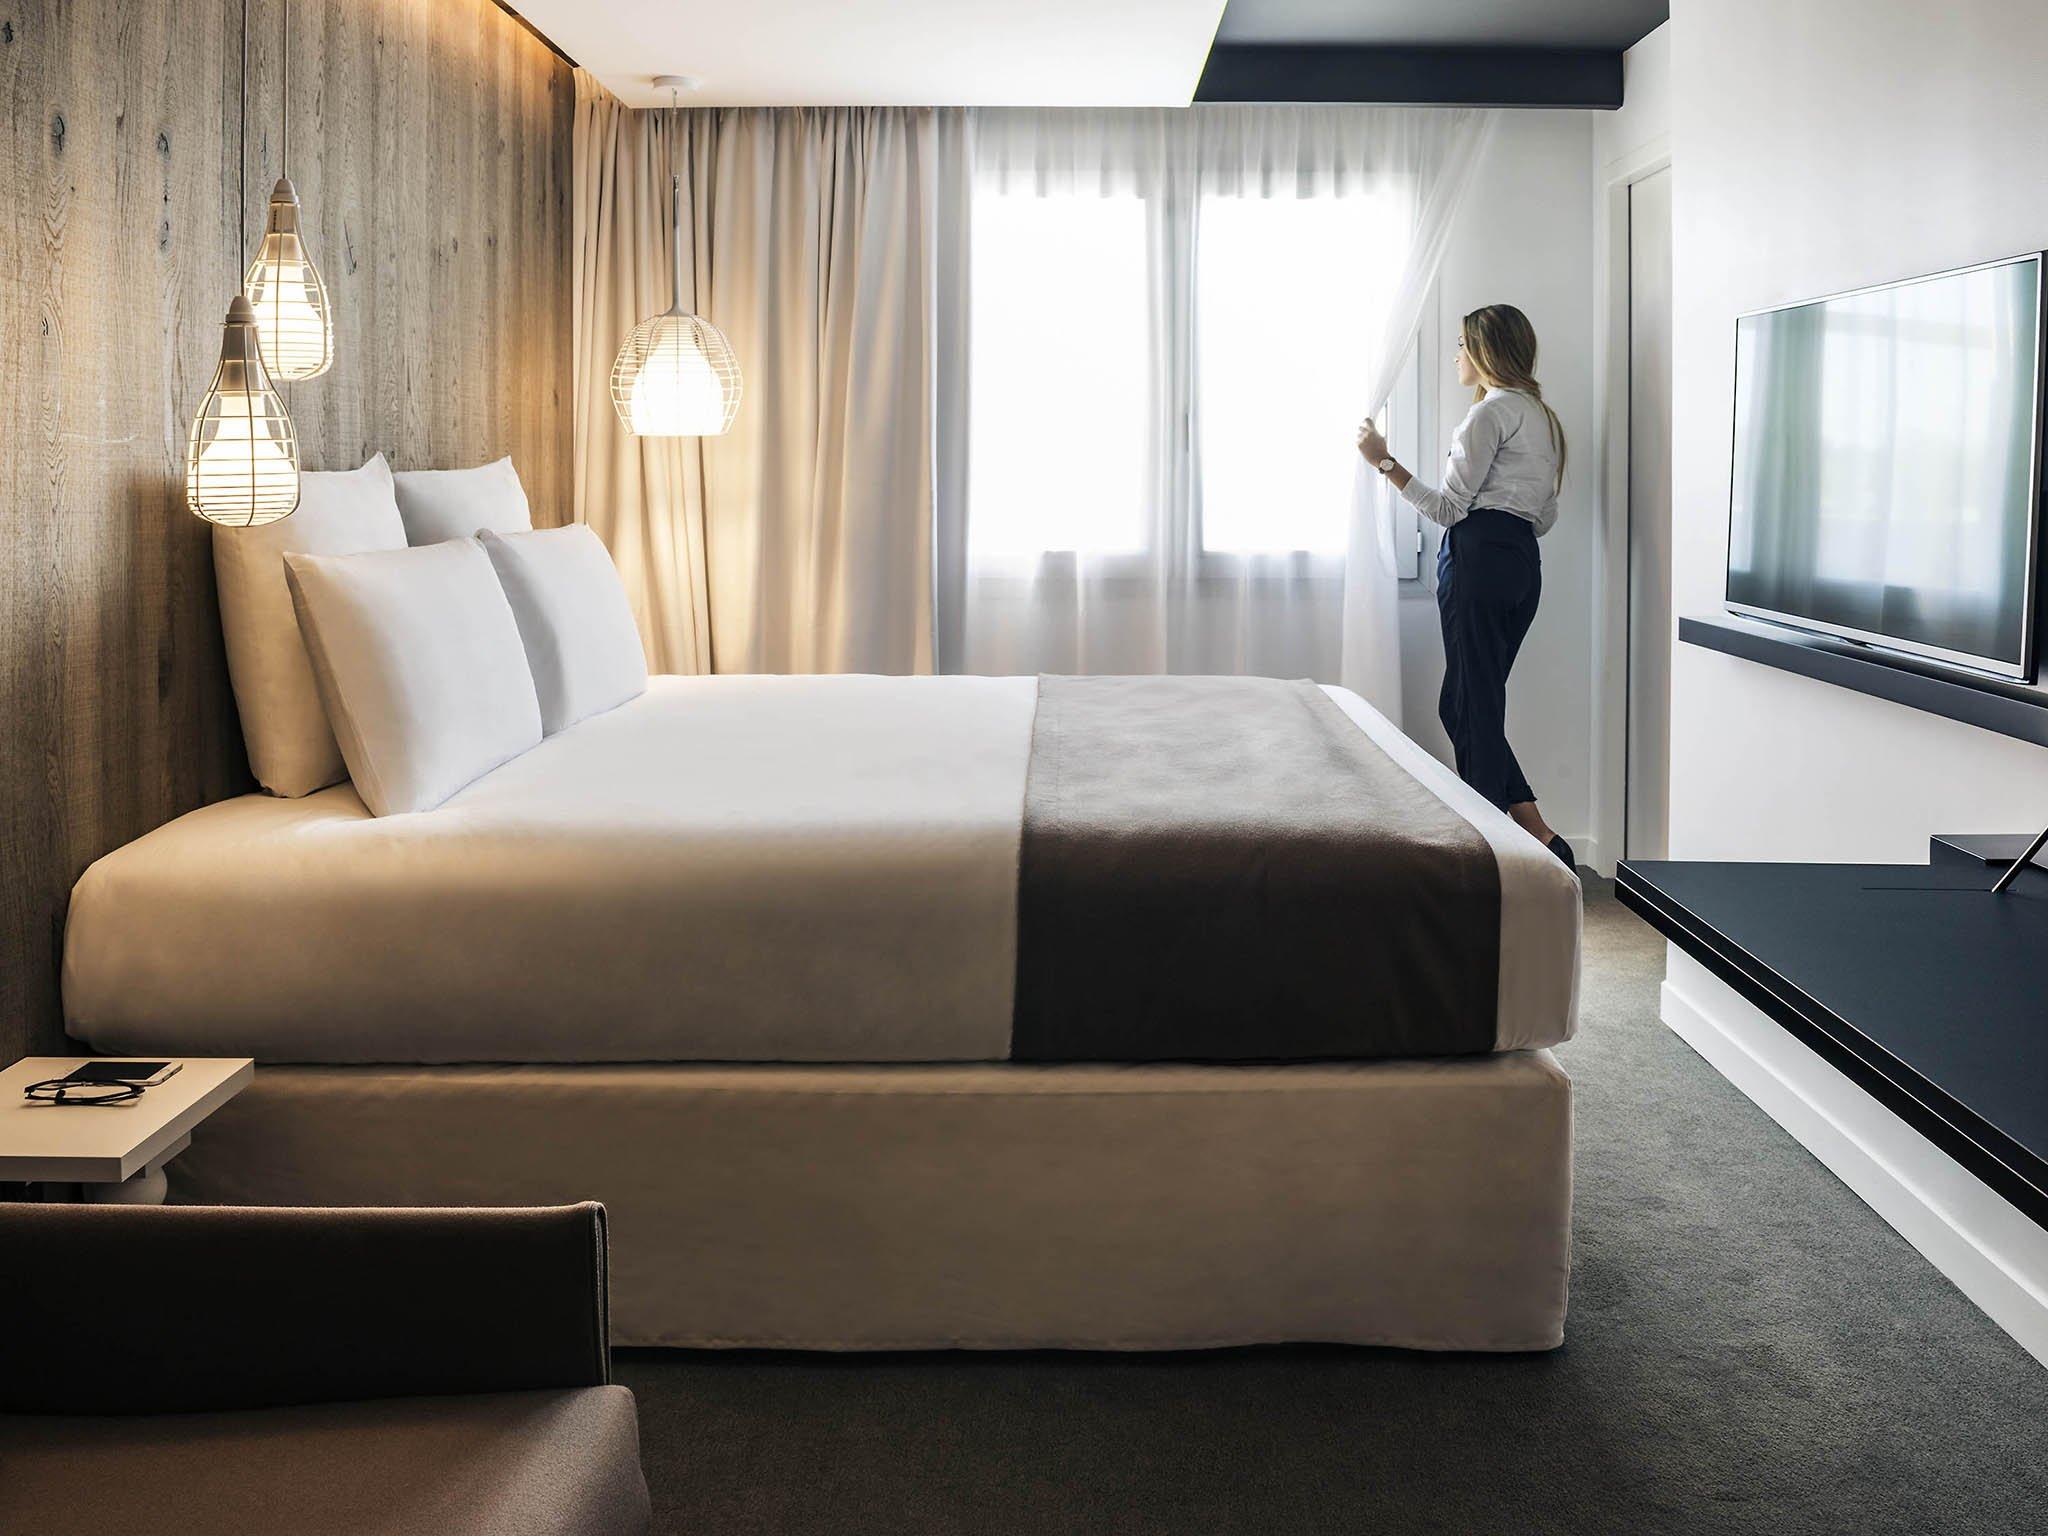 Hotel Mercure Valence Sud